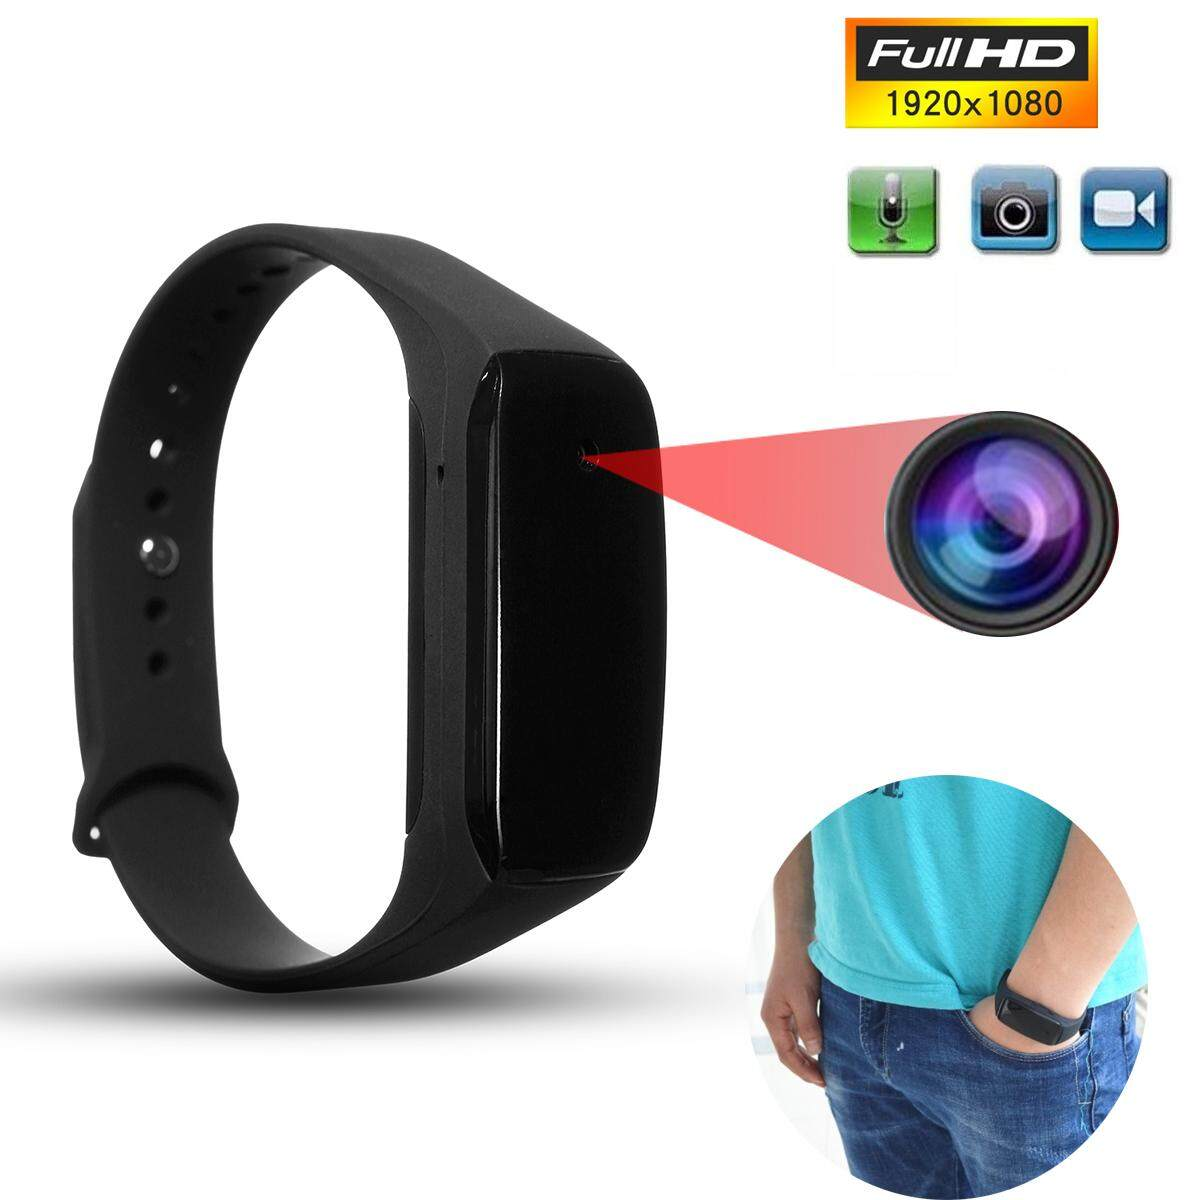 Hd 1080p Cam Dvr Hidden Camera Wearable Wrist Watch Mini Dv Dvr Video Recorder By Audew.